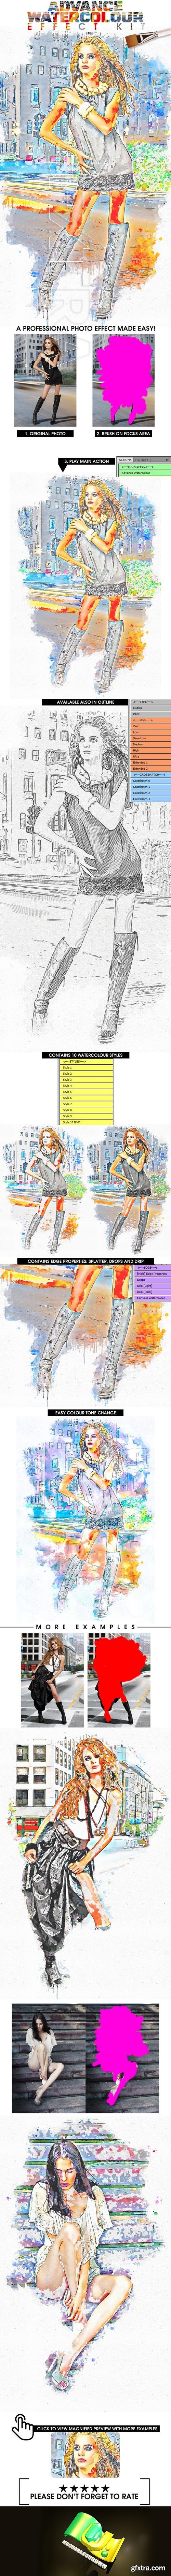 GraphicRiver - Advance Watercolour Effect Kit 22111988